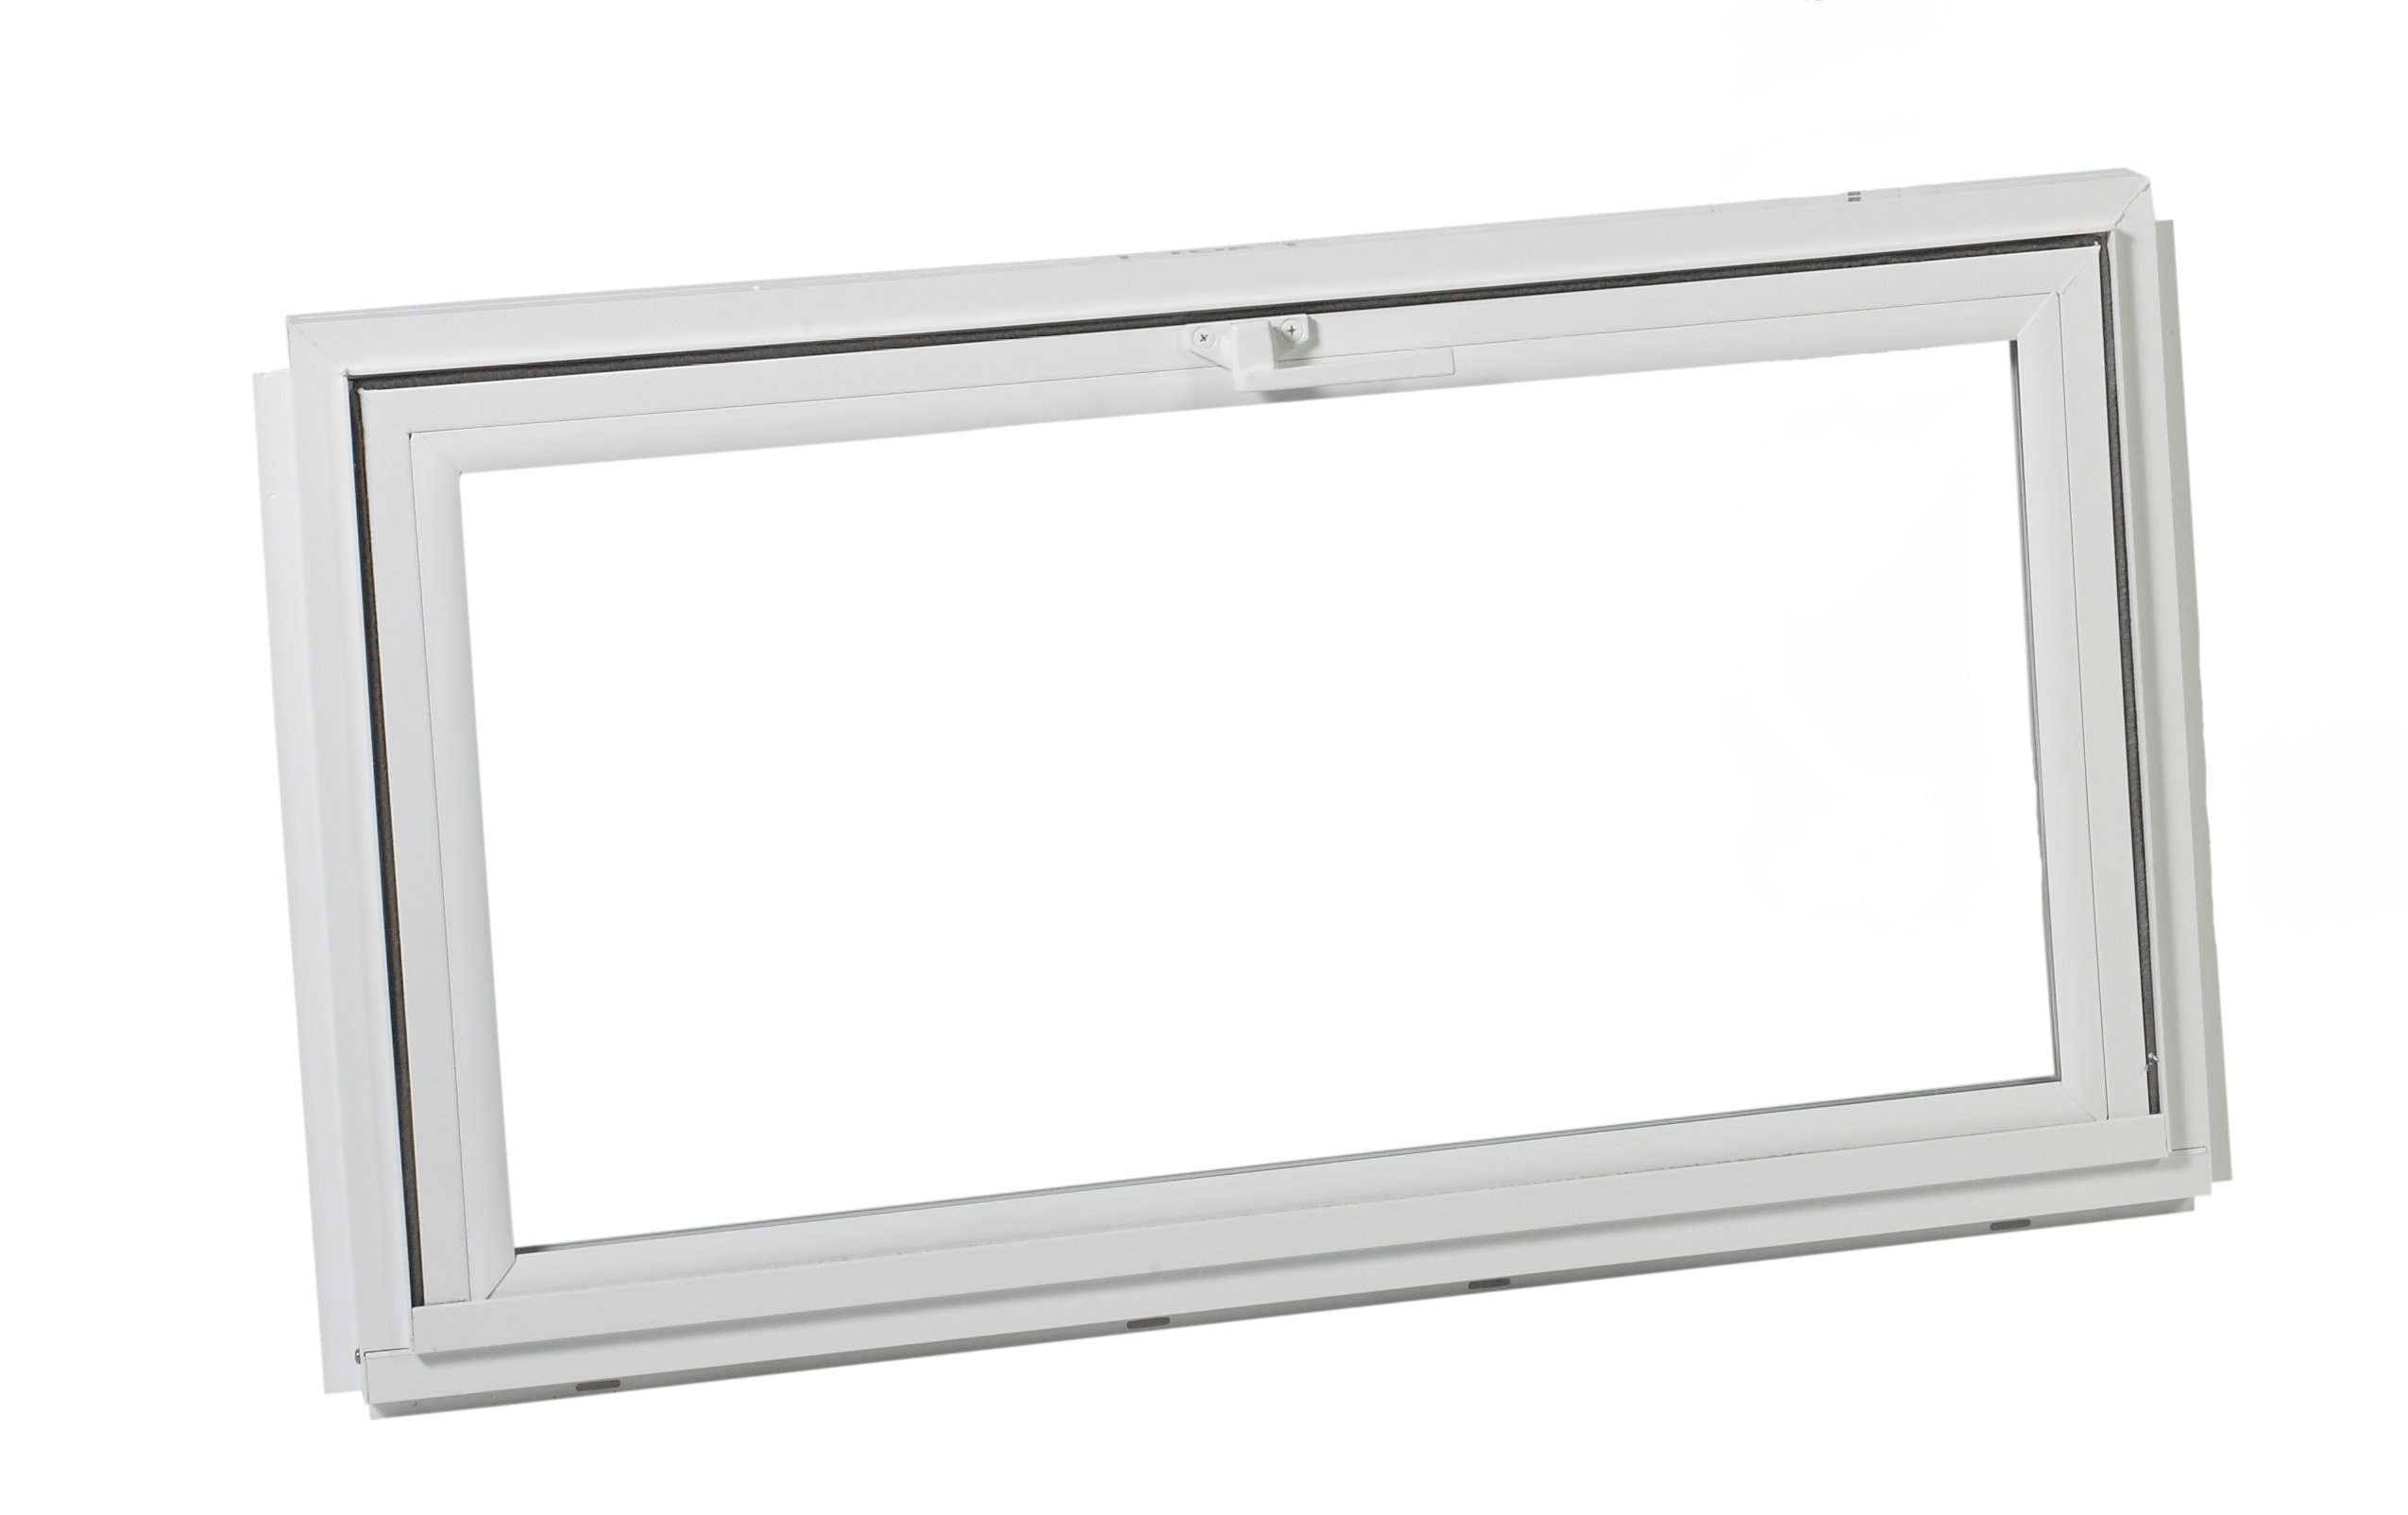 Mutual Industries 7130-32-22 Competitor Basement Window, 32'' x 22''